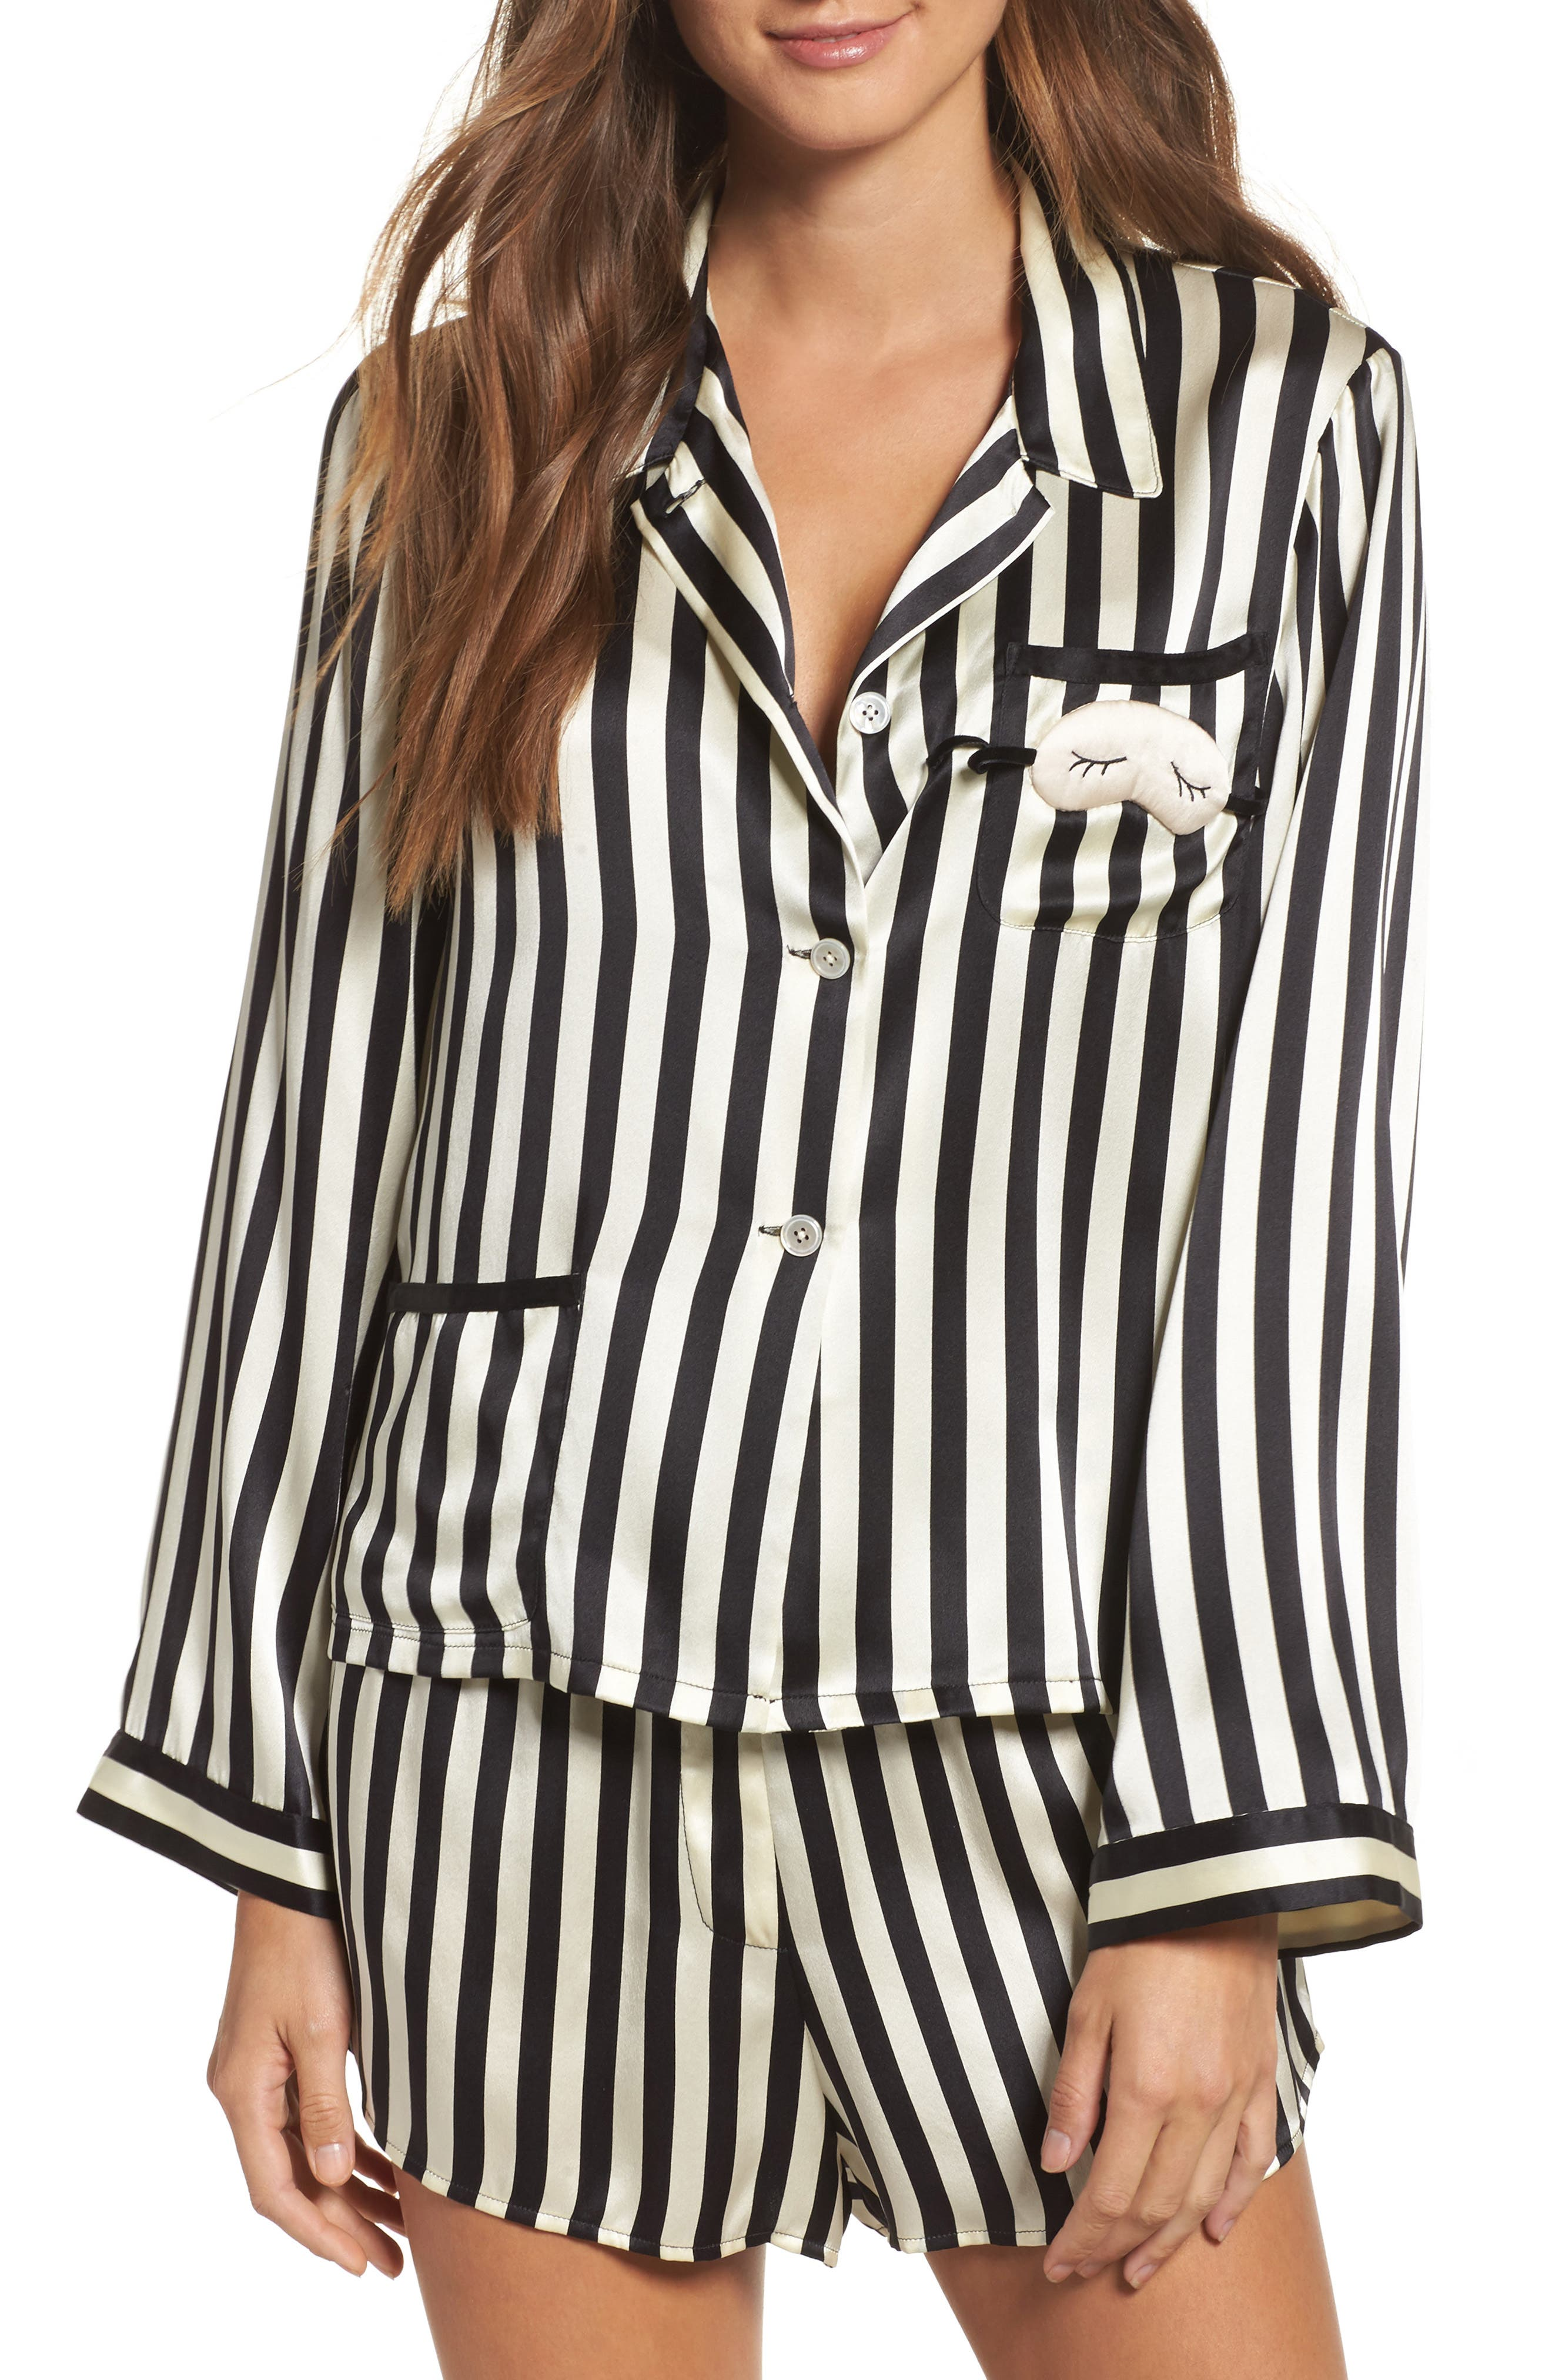 x Amanda Fatherazi Mini Mask Corey Stripe Silk Shorts,                             Alternate thumbnail 5, color,                             Noir/ Ecru